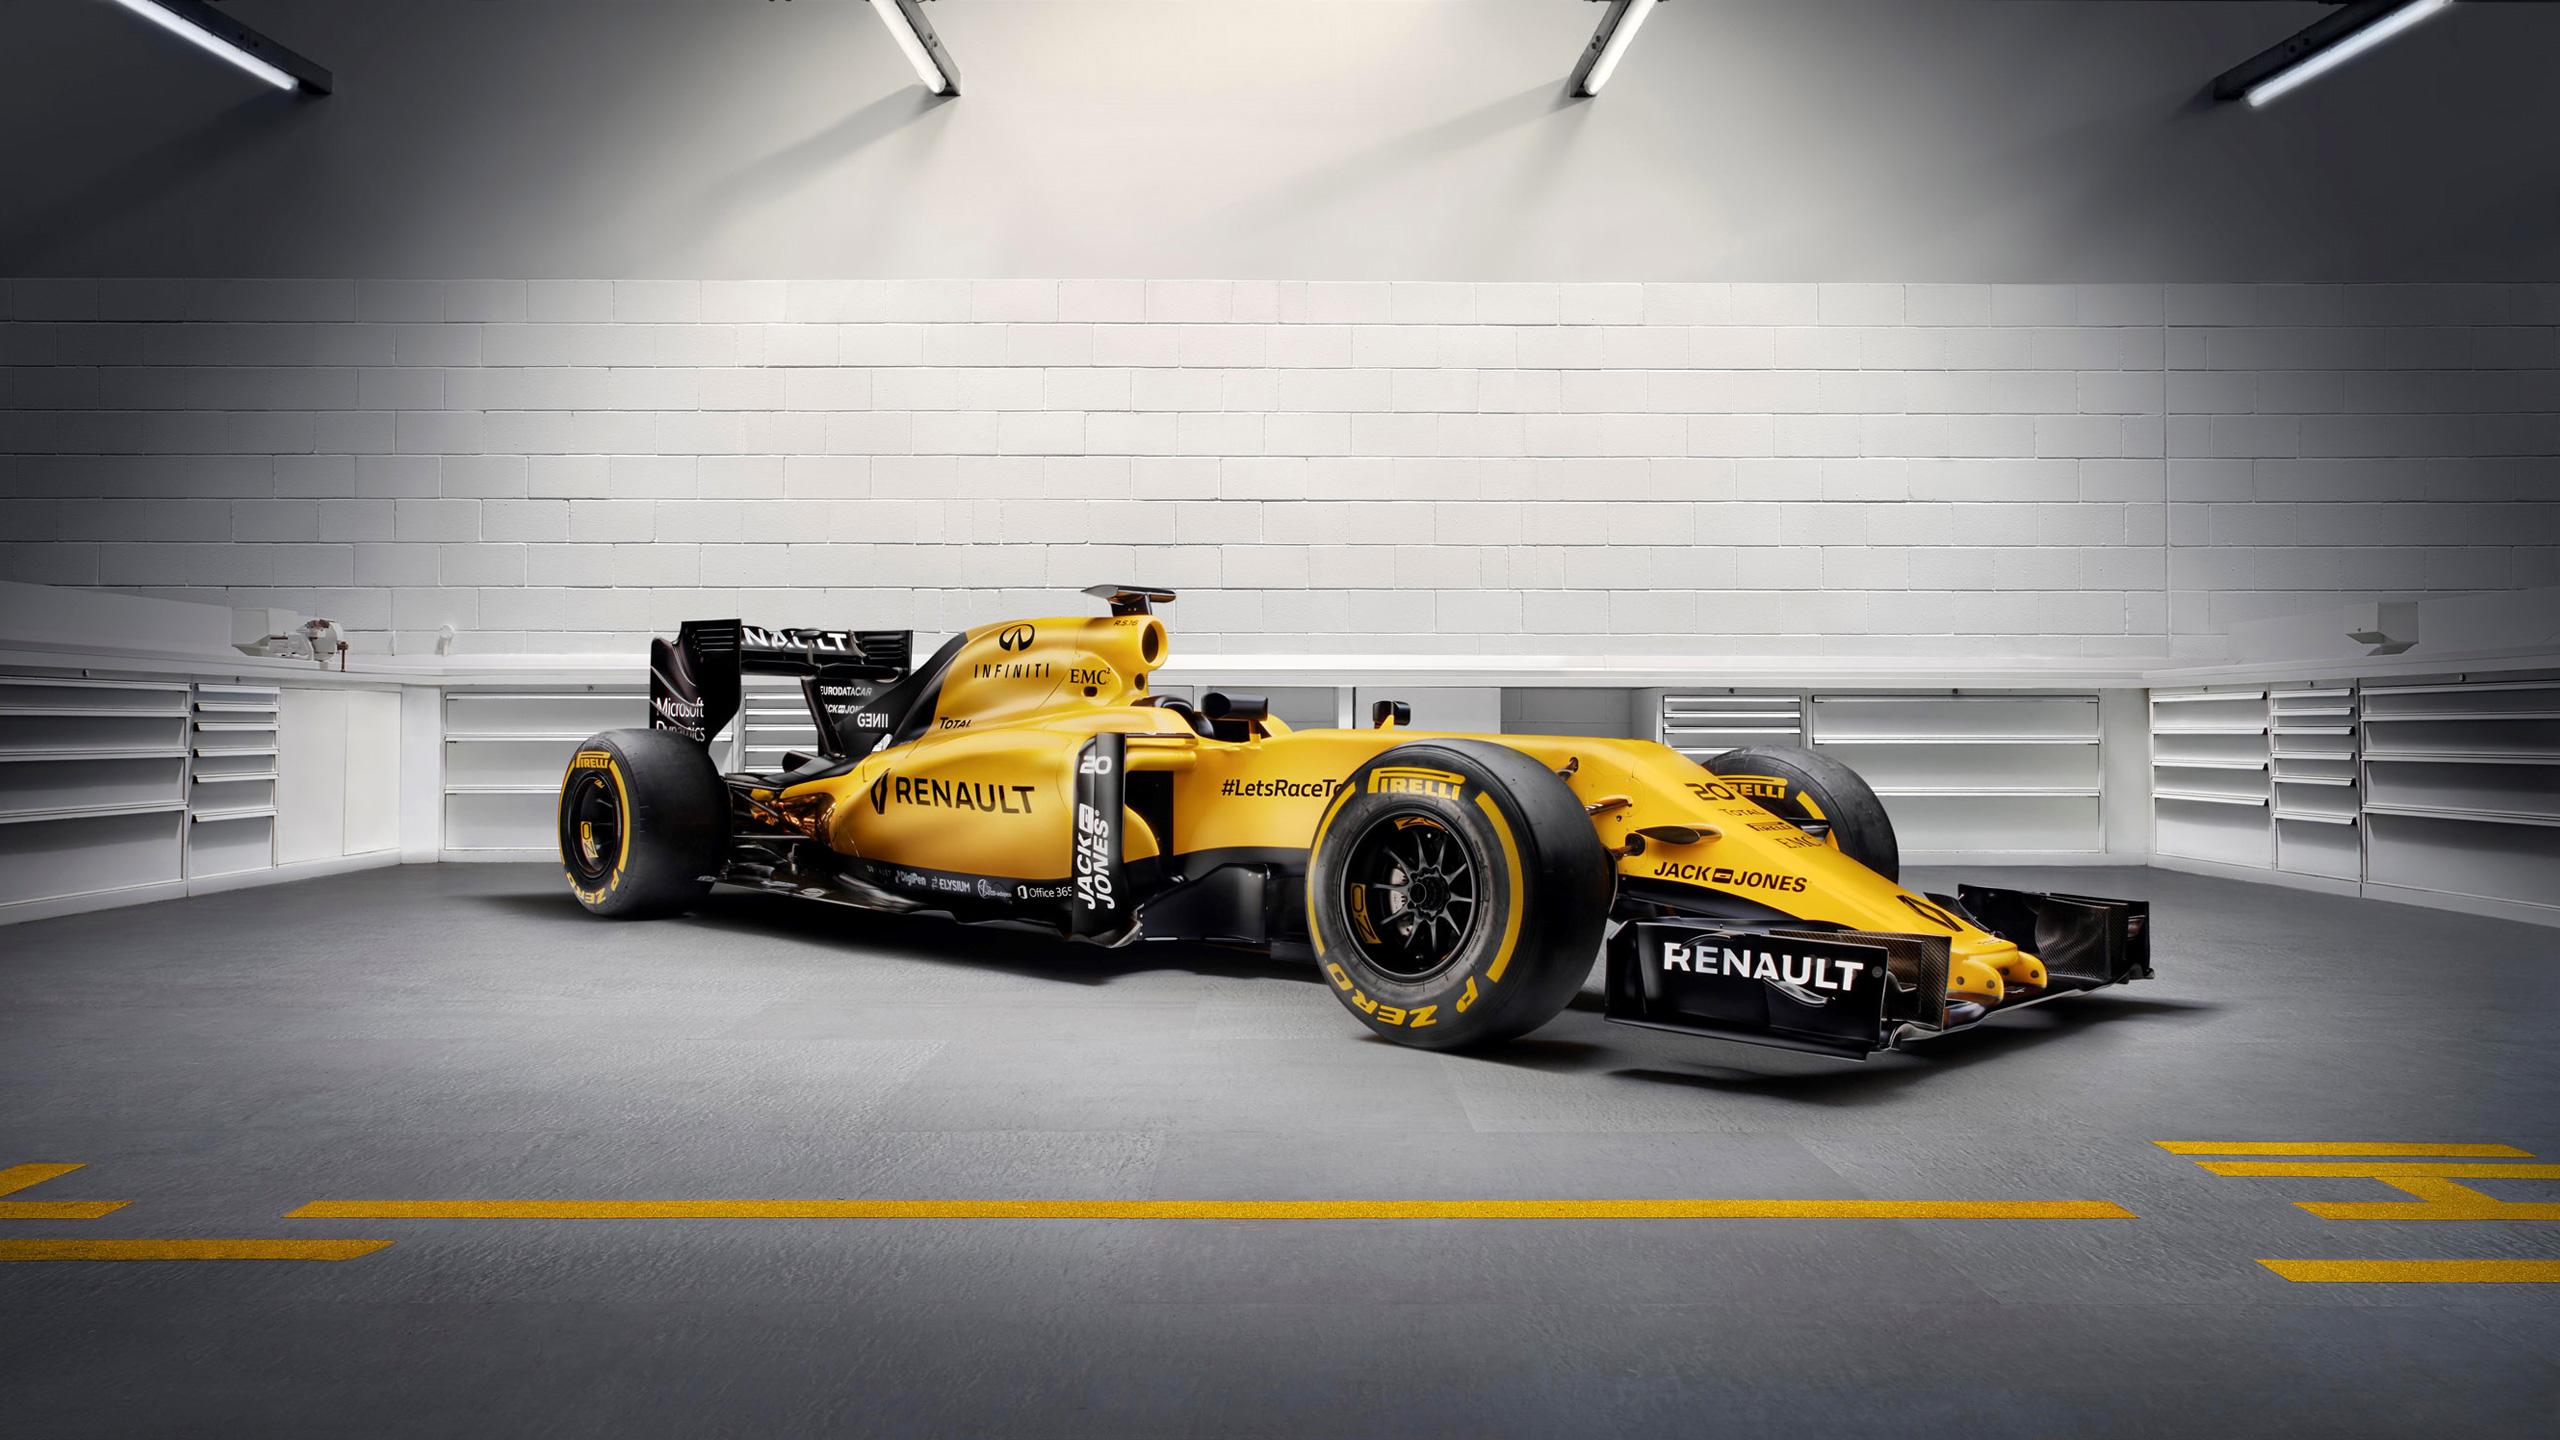 2016 Renault Rs16 Formula 1 Wallpaper Hd Car Wallpapers Id 6320